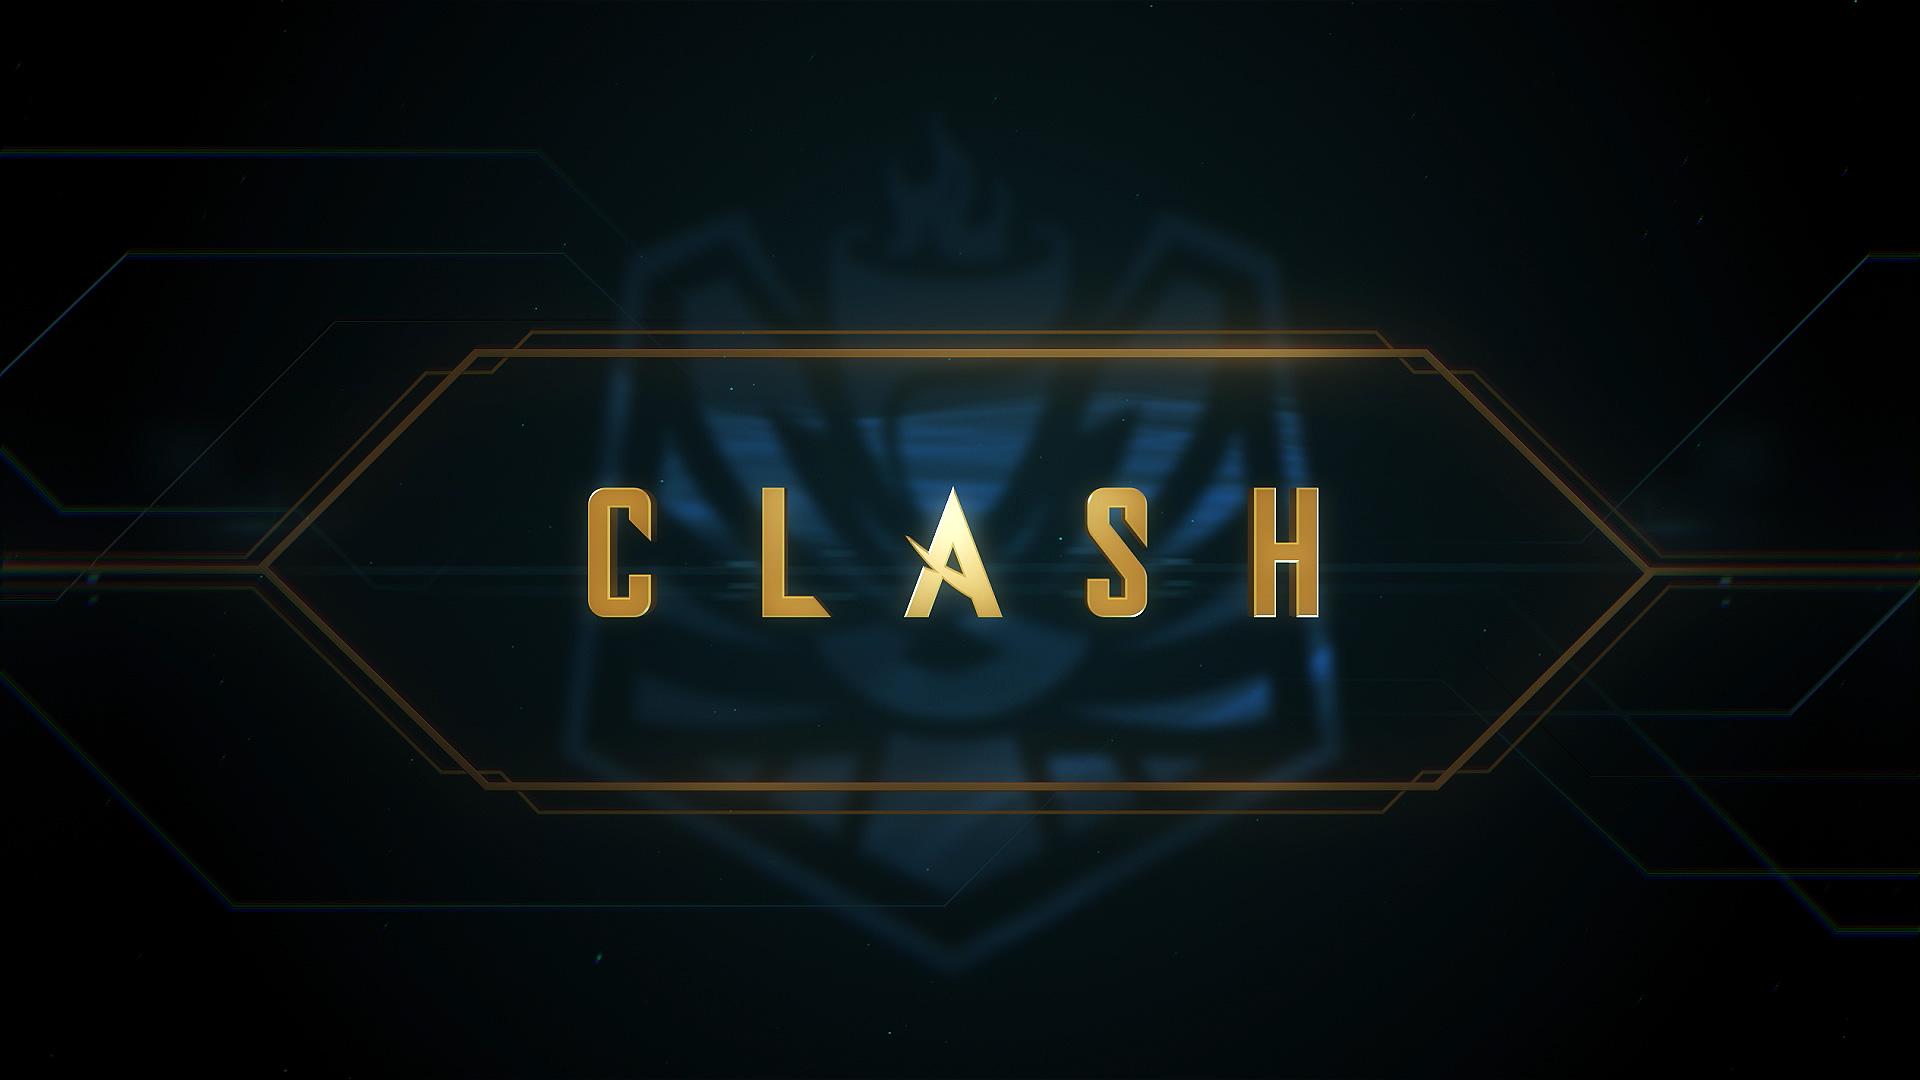 League of Legends: 3 Ways Riot Games Can Improve Clash